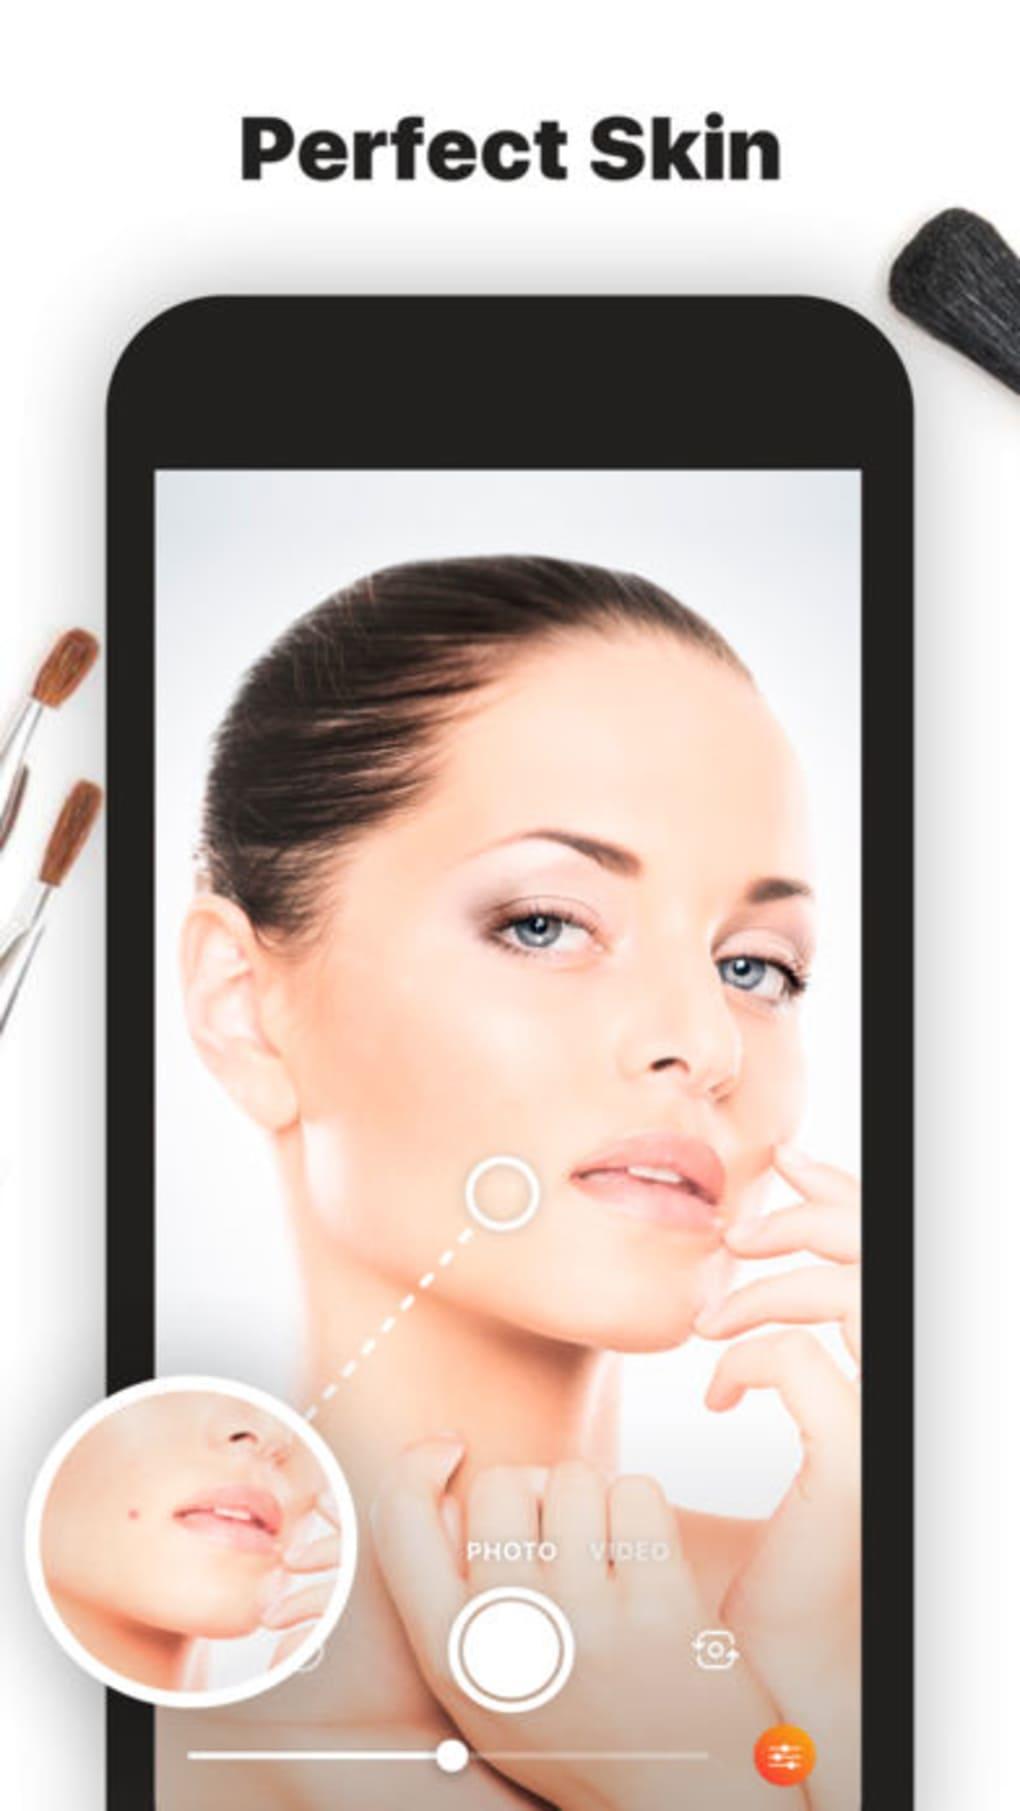 EasySnap: Selfie Beauty Camera for iPhone - Download